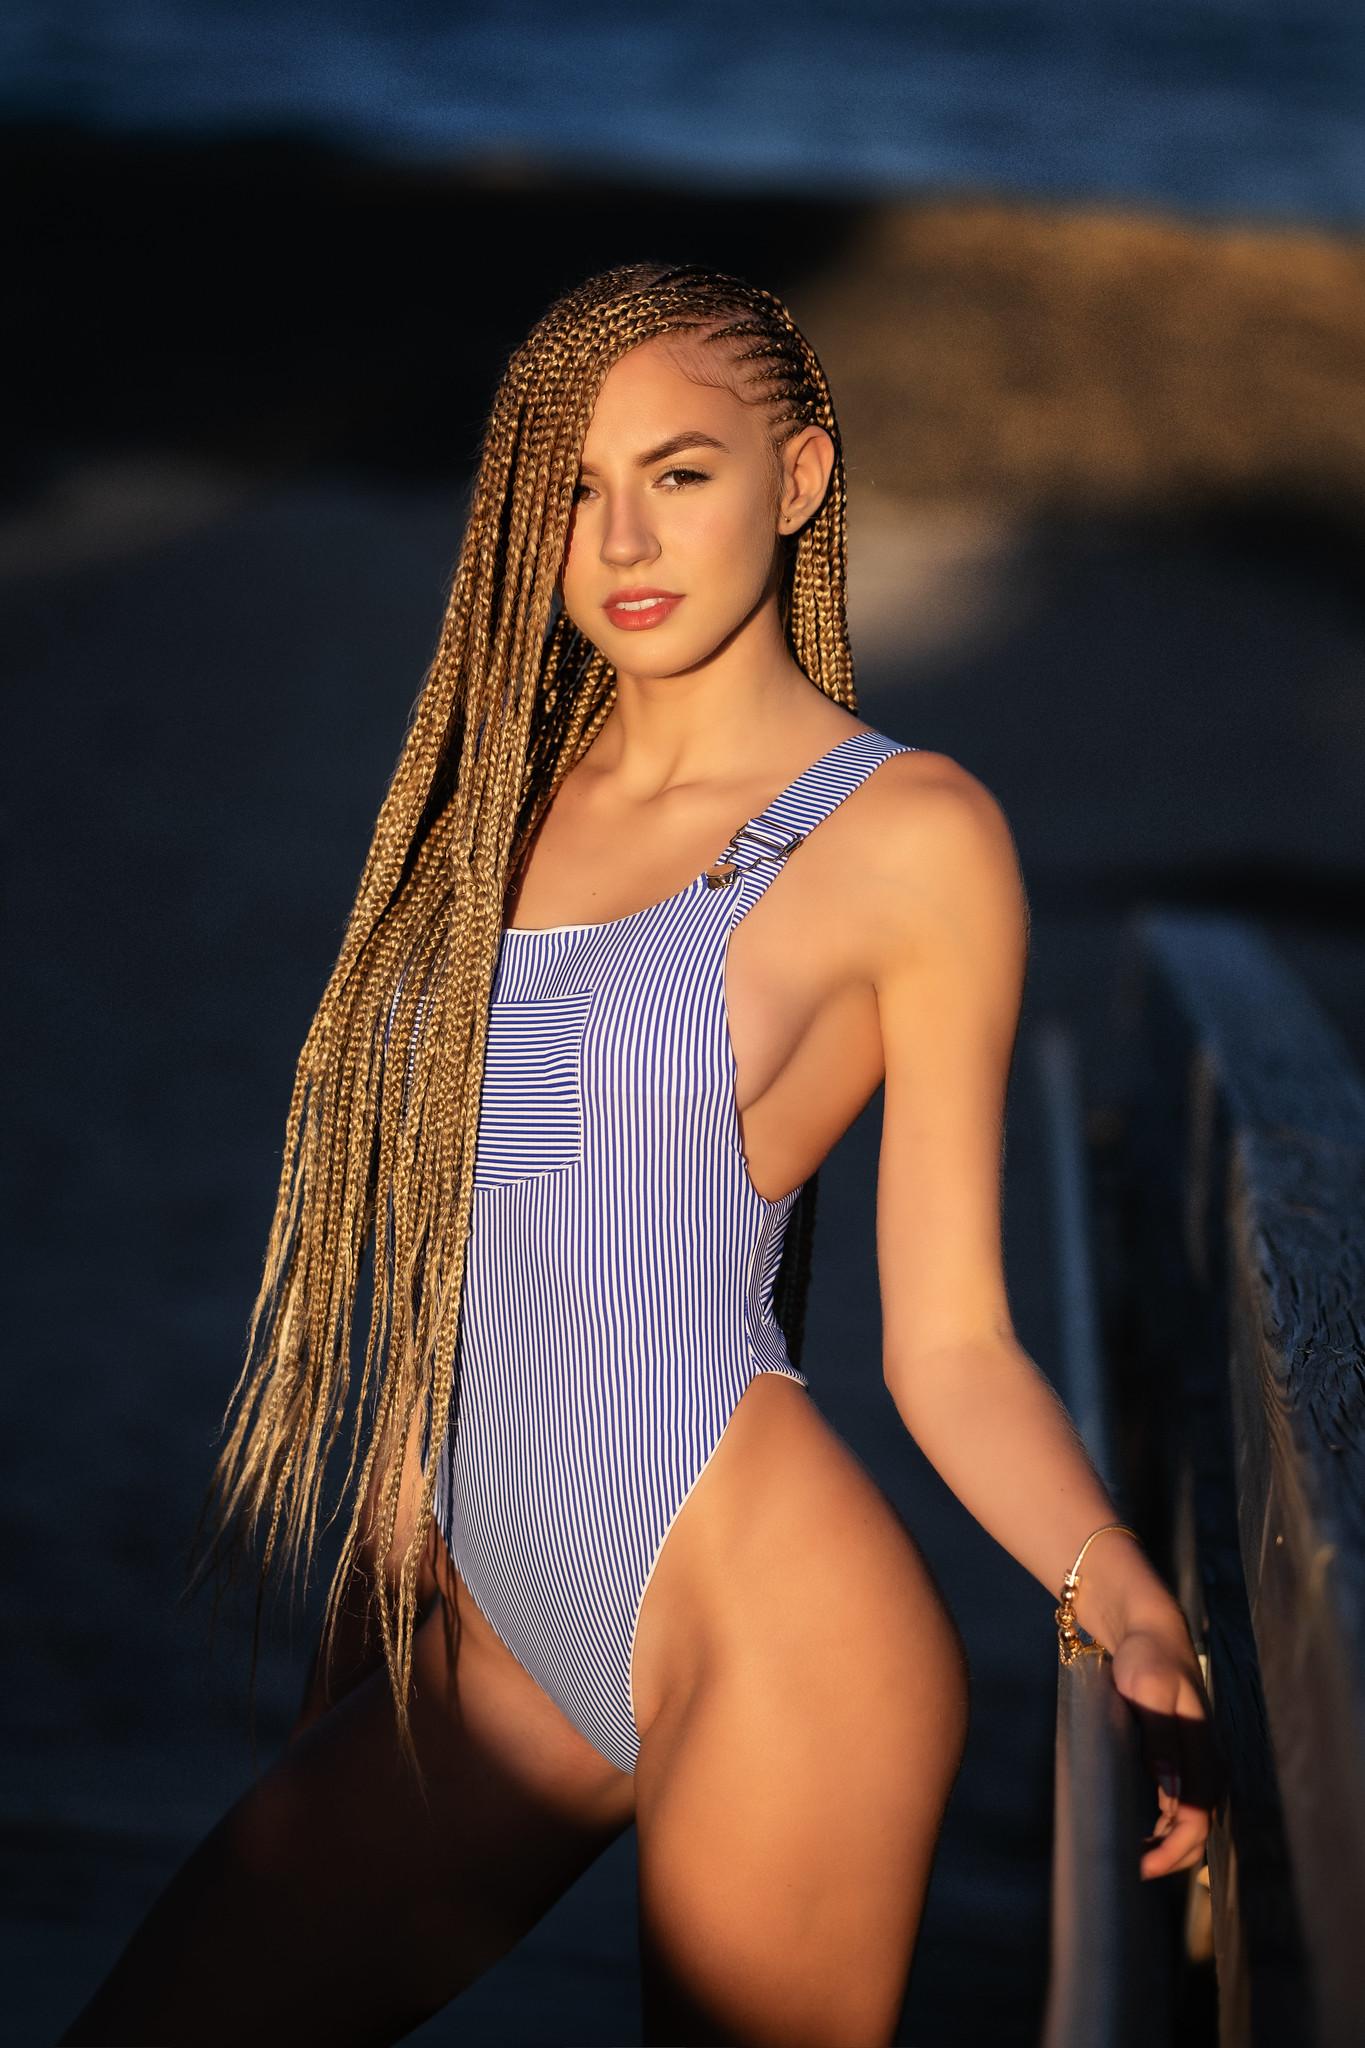 Wallpaper : model, blonde, looking at viewer, touching